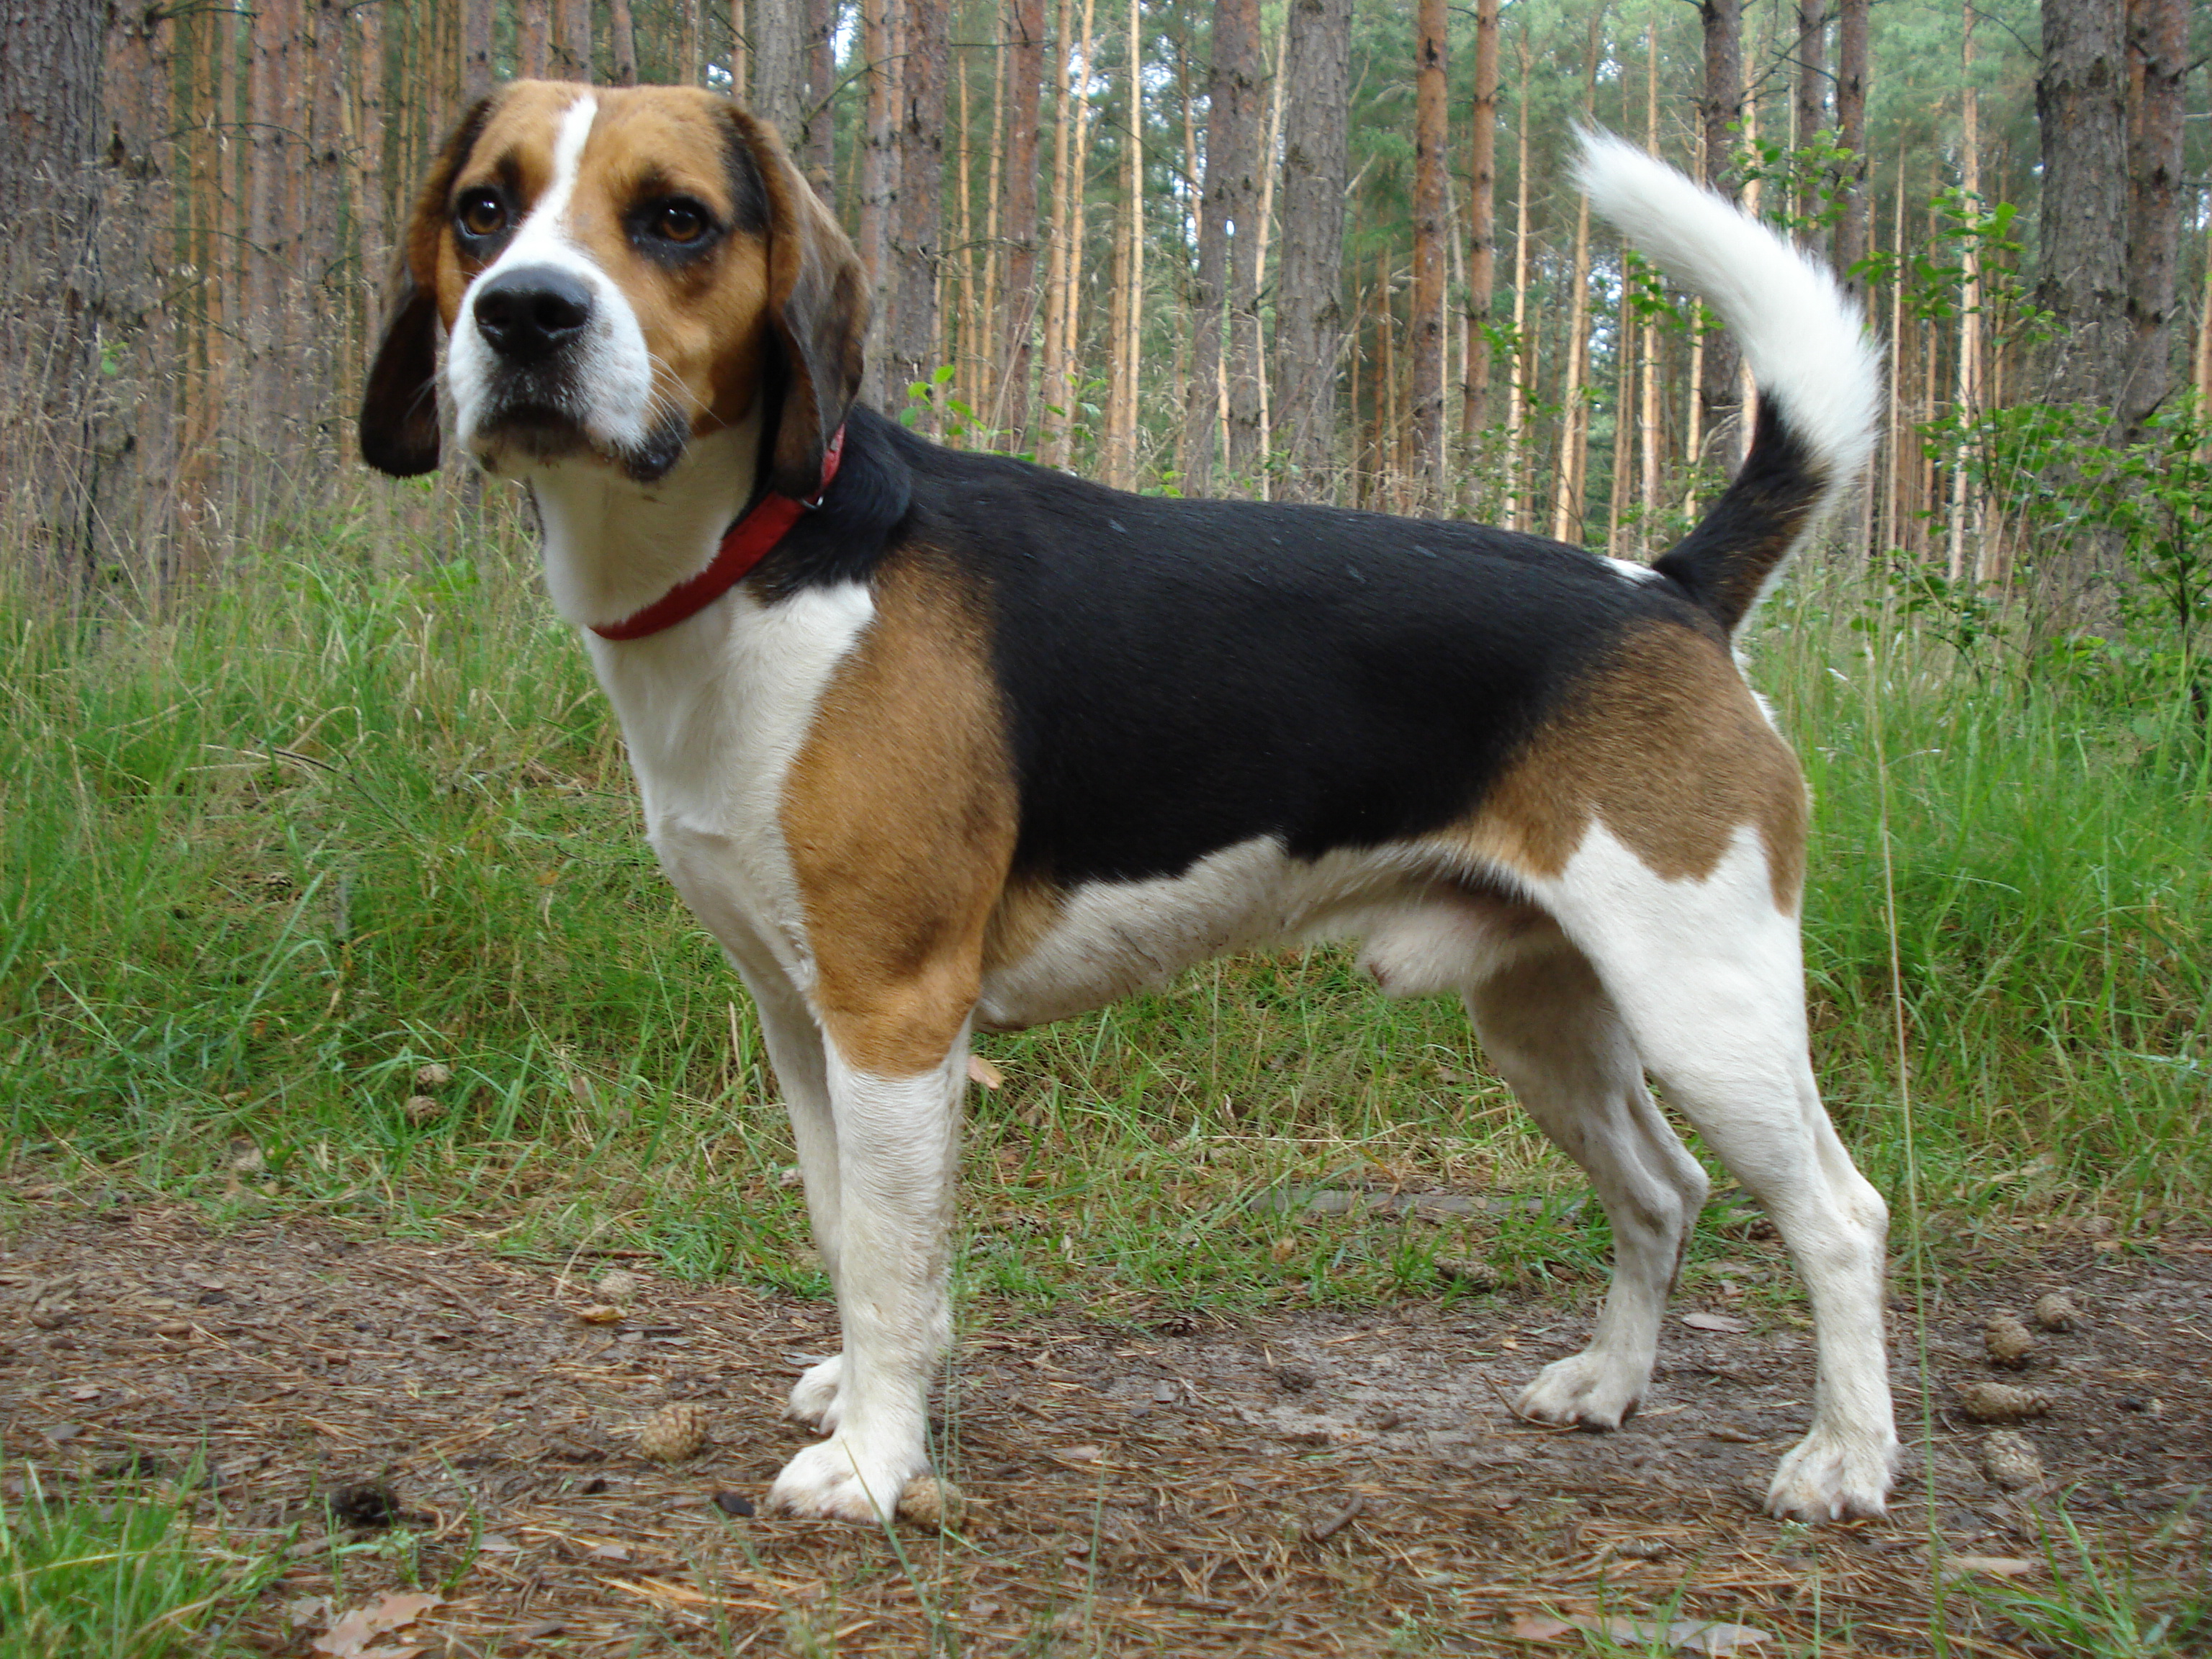 File:Beagle harrier.JPG - Wikimedia Commons